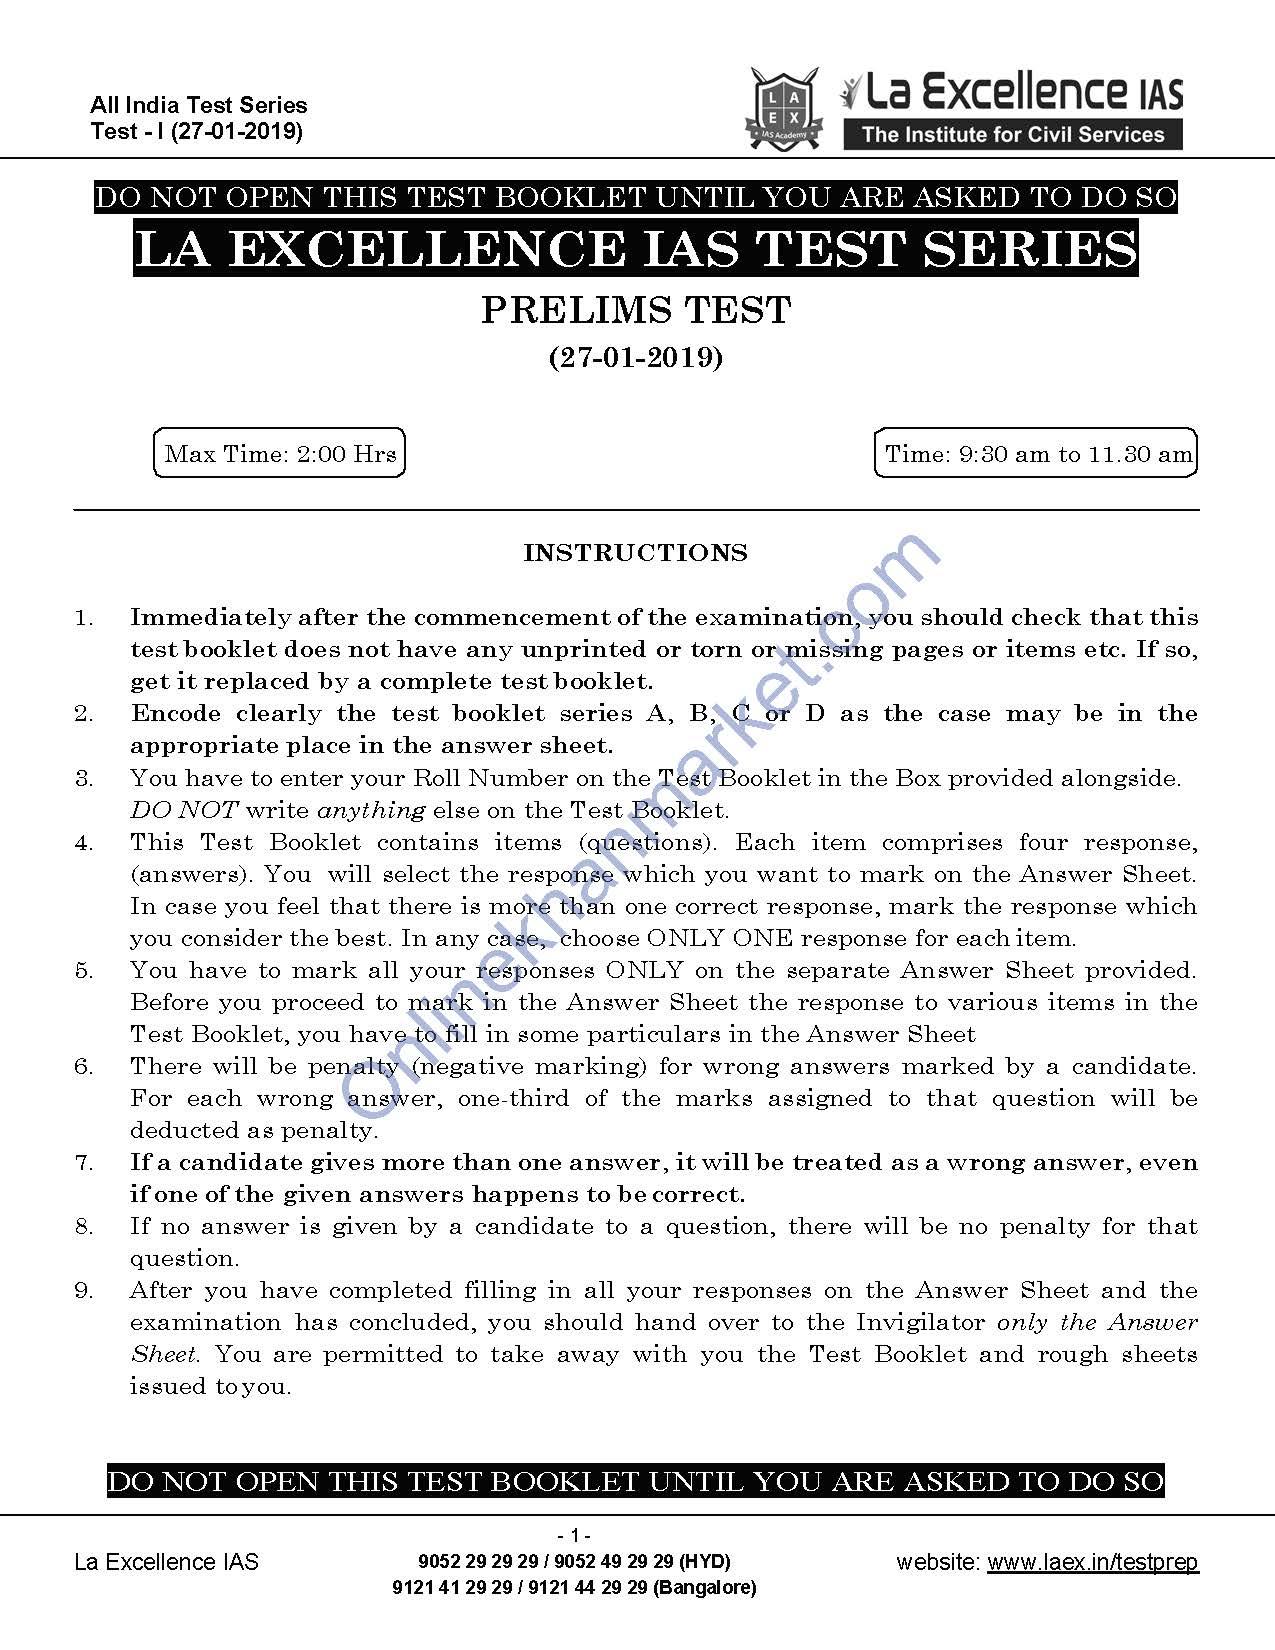 LA EXCELLENCE IAS Prelims Test Series Free 2019